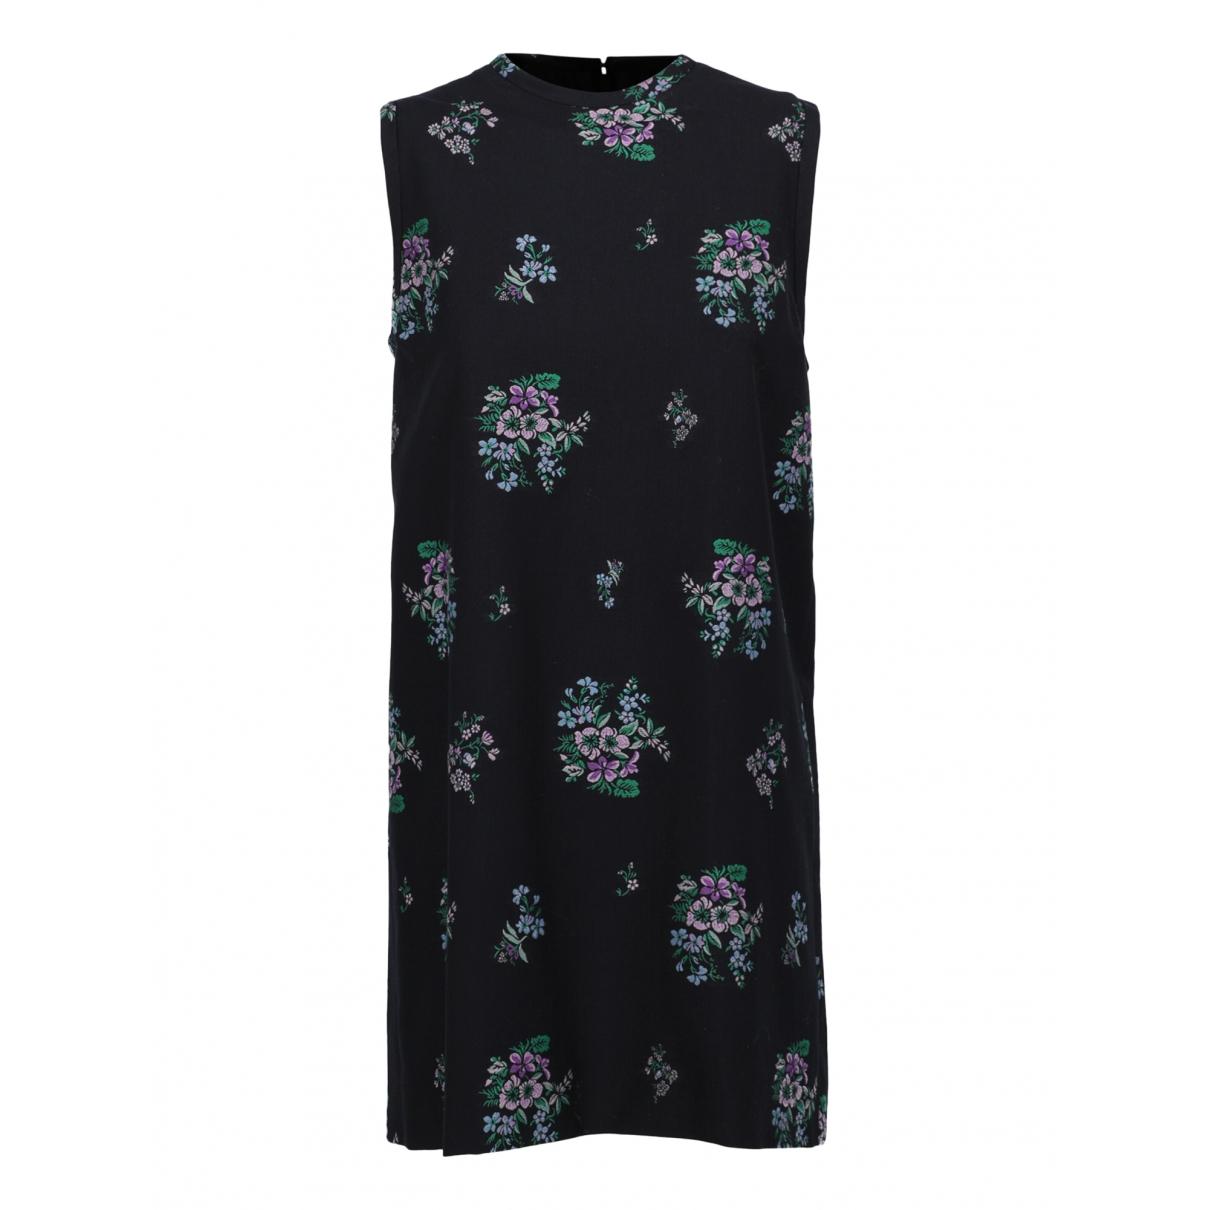 Gucci \N Black Cotton dress for Women 40 IT